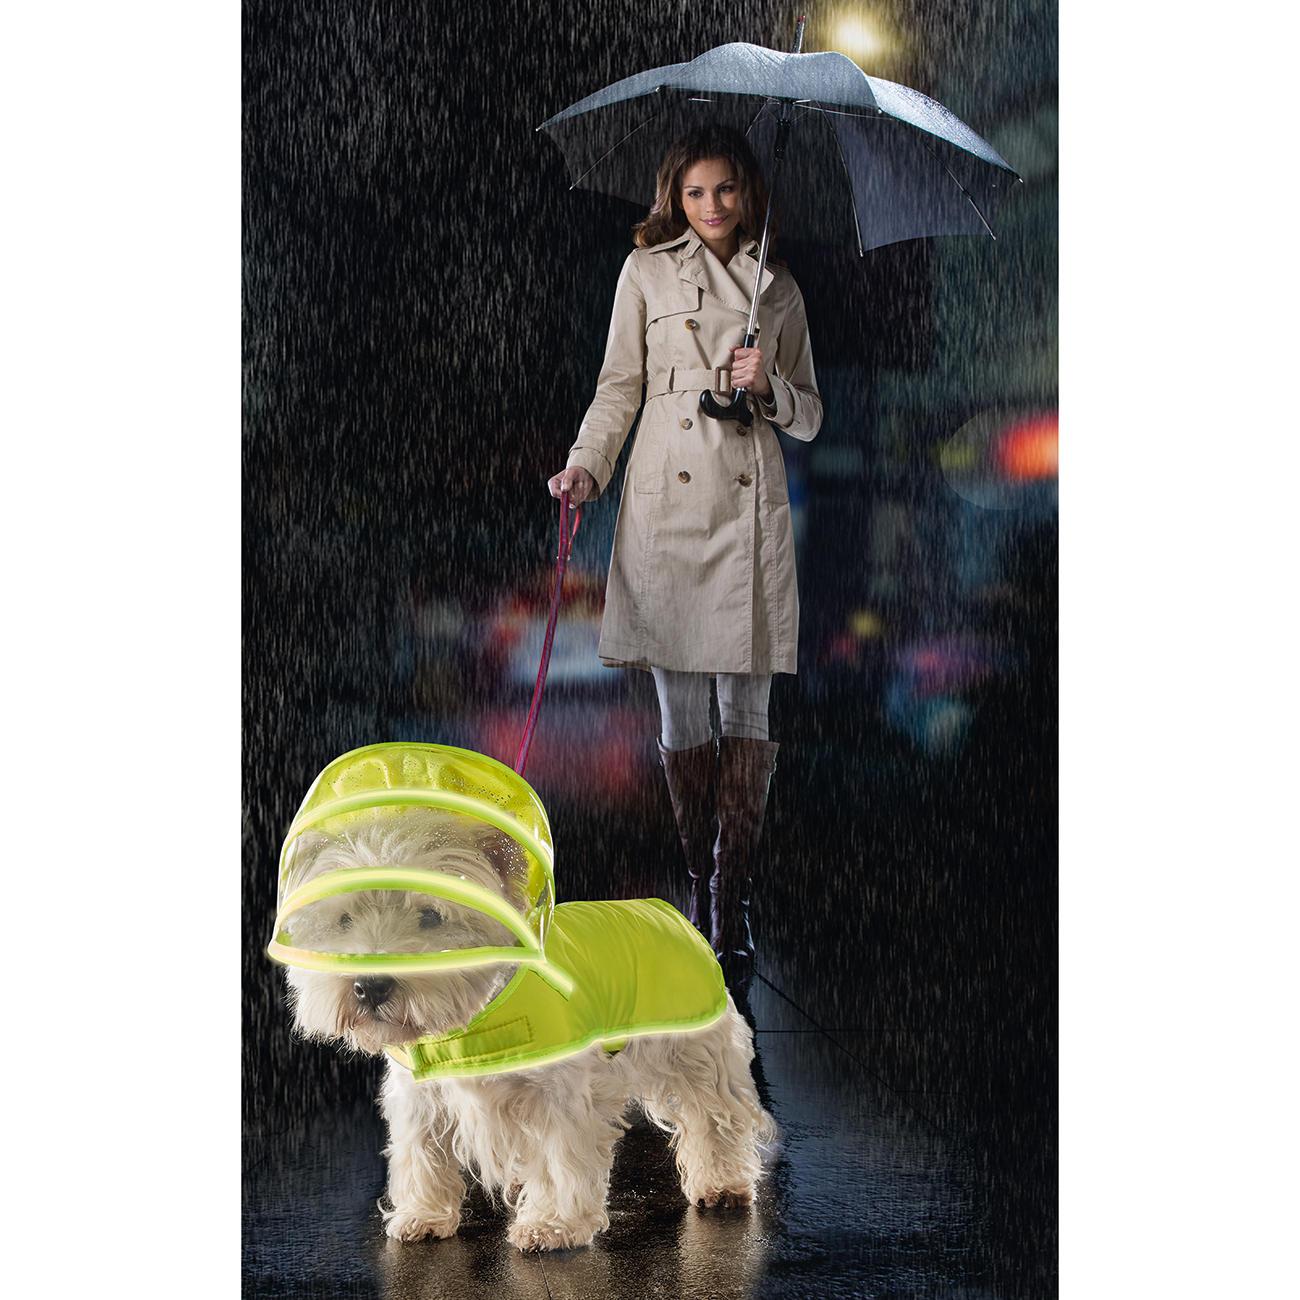 hunde regenmantel push pushi mit 3 jahren garantie. Black Bedroom Furniture Sets. Home Design Ideas